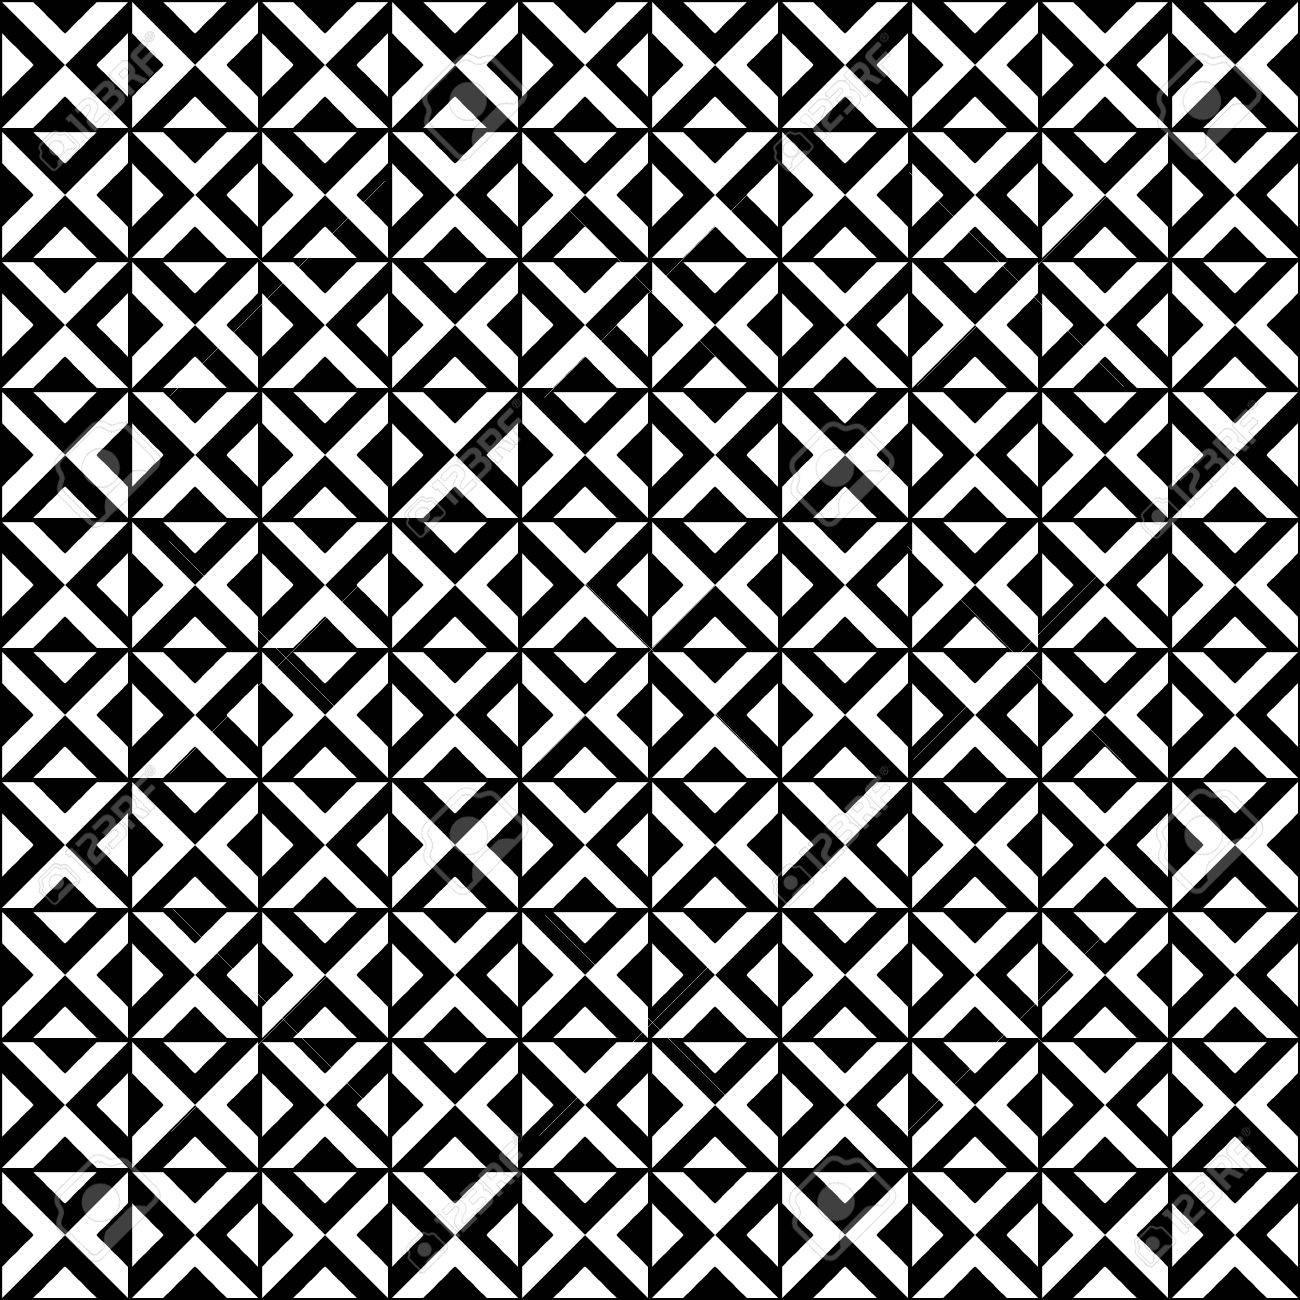 black and white geometric tiles seamless pattern